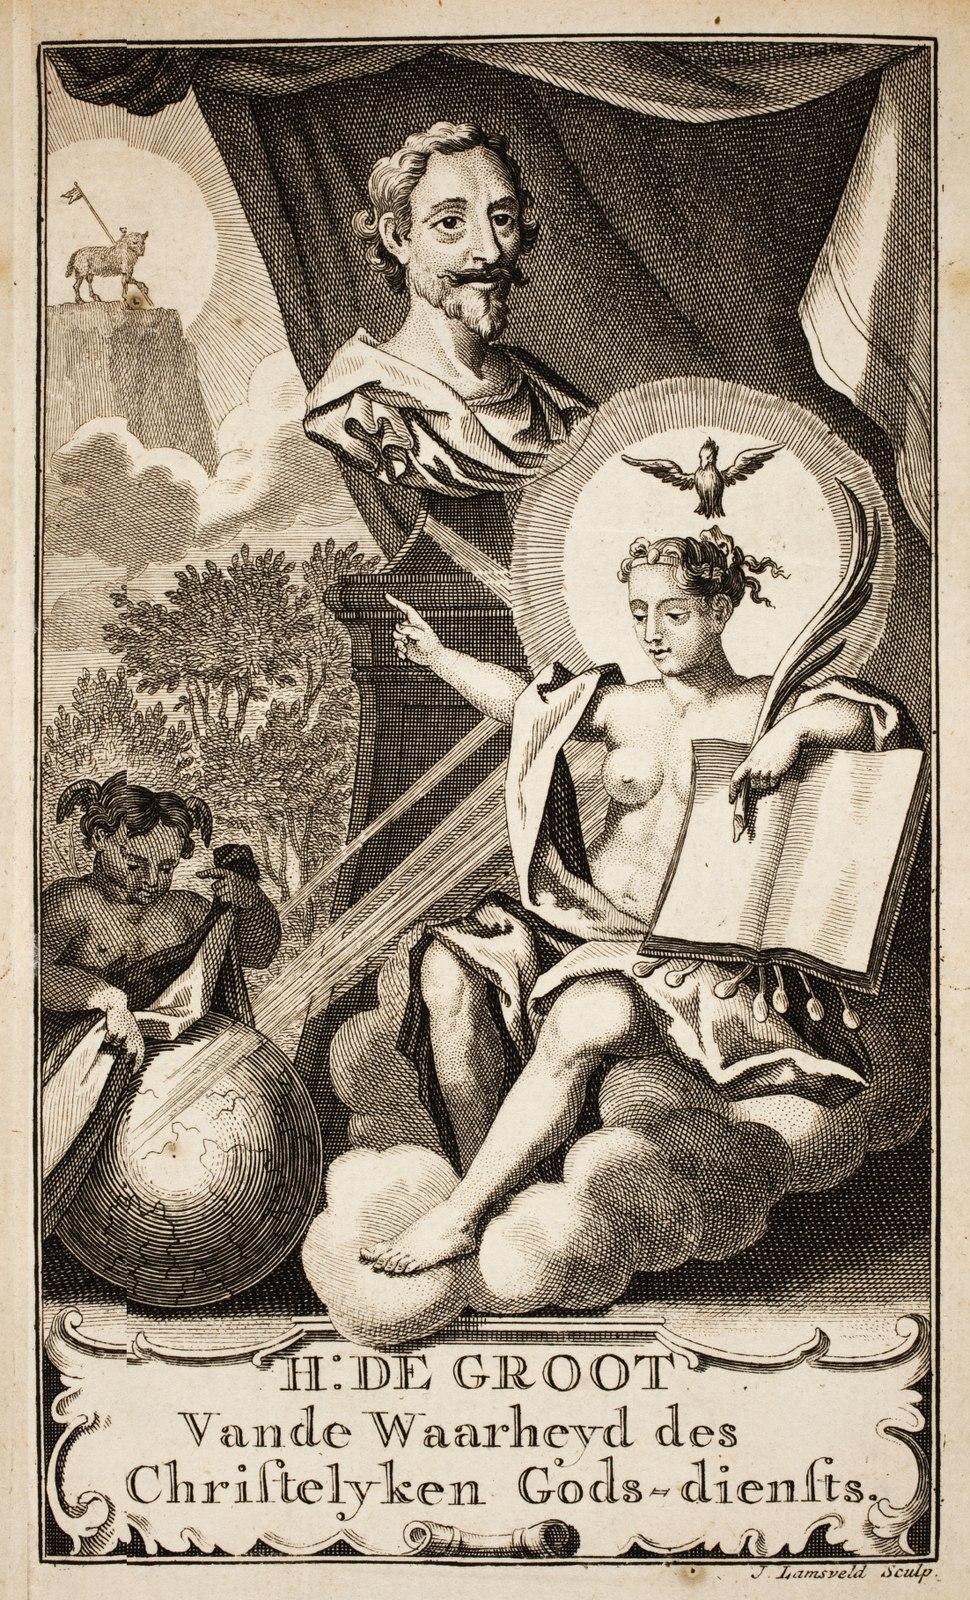 Hugo-de-Groot-Oudaen-Patrick-Le-Clerc-Van-de-waarheid-des-christelyken-godsdiensts MG 1338